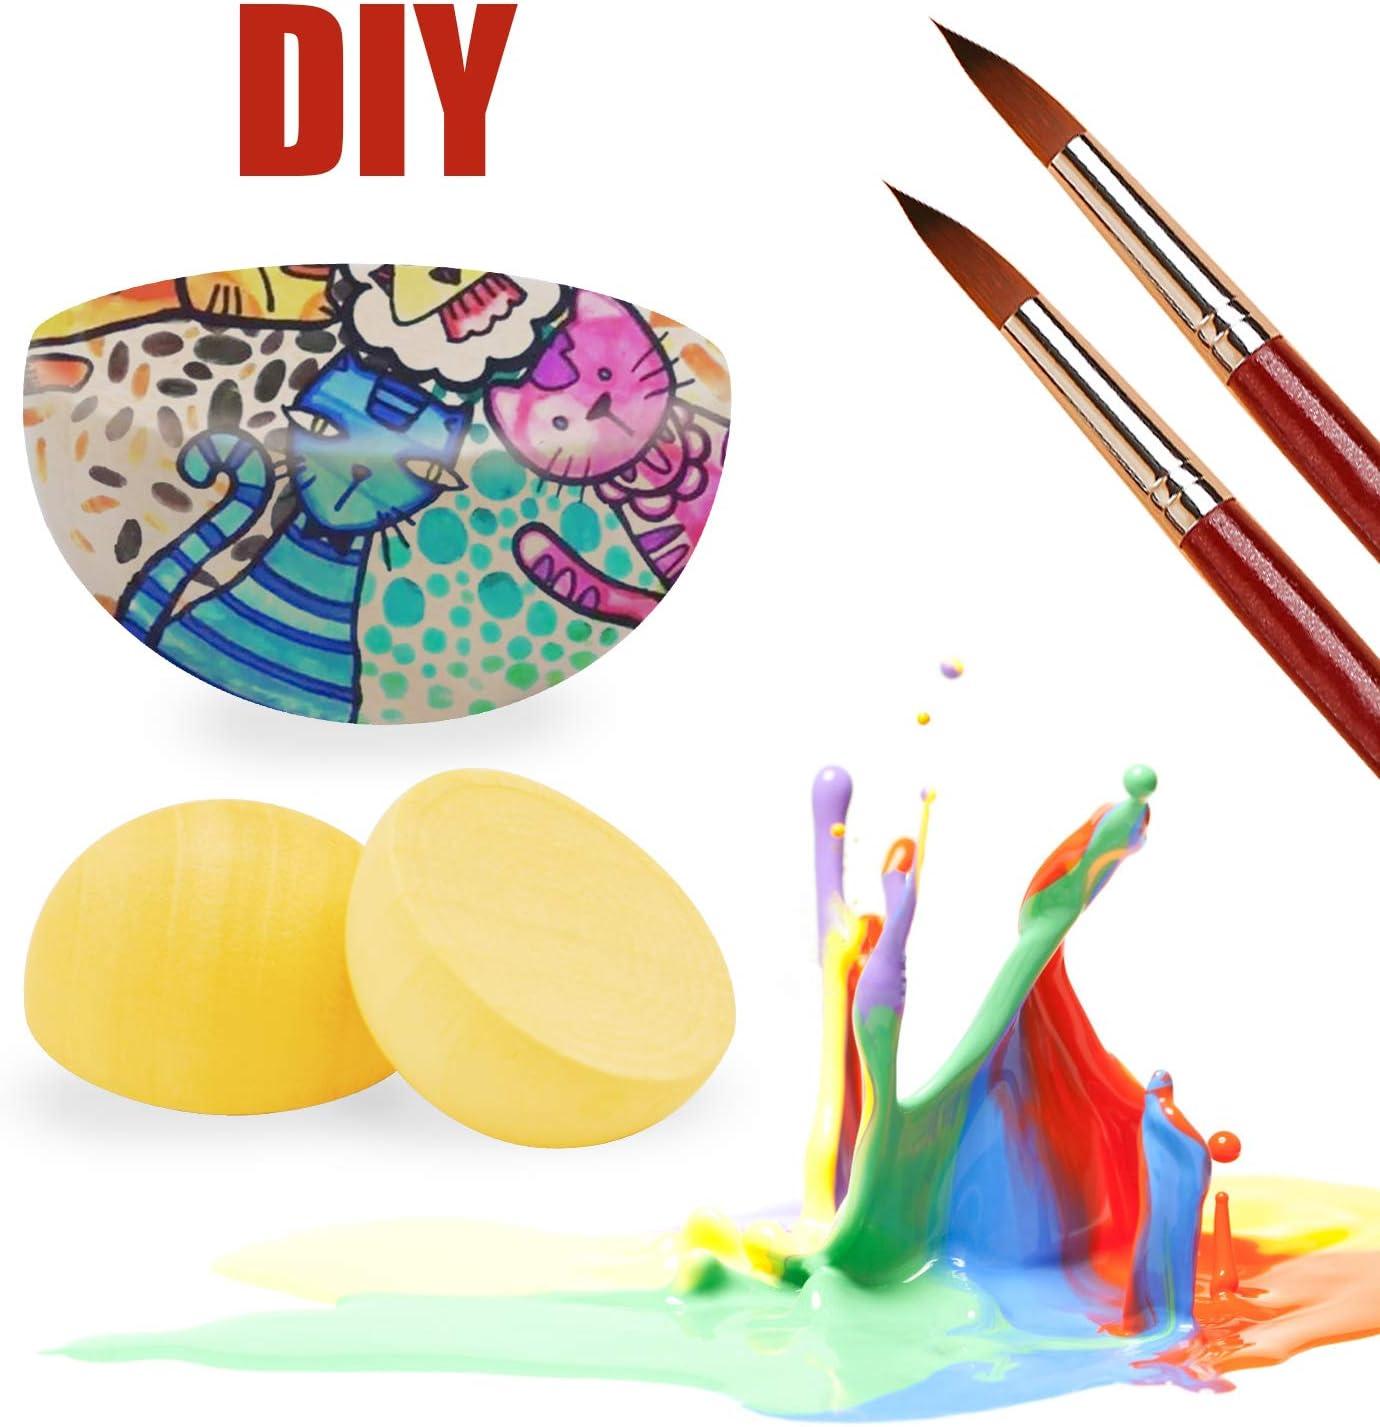 100 Pieces Diameter 20mm Split Wood Balls Half Wooden natural Balls Half Round Ball for DIY Projects Crafts Kids Arts